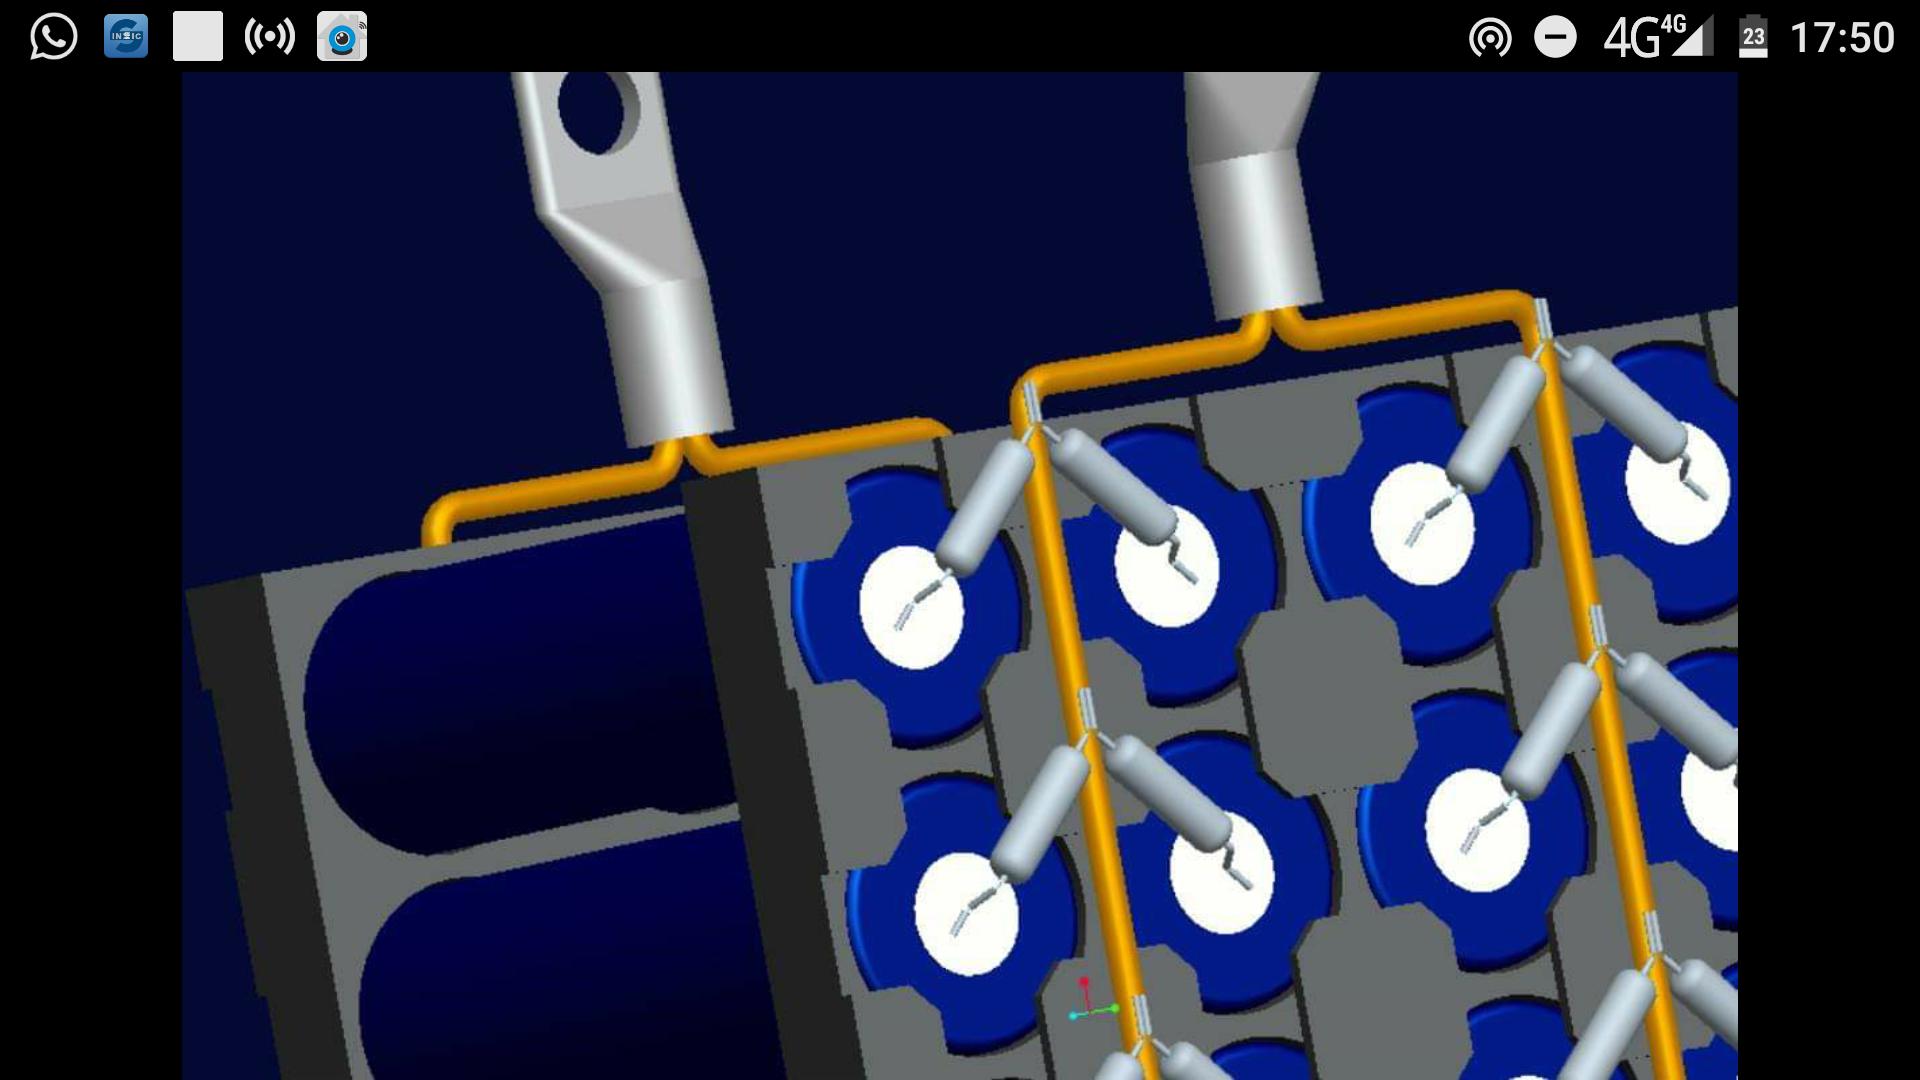 http://www.energialternativa.info/public/newforum/ForumEA/U/Screenshot_20190502-175010.png